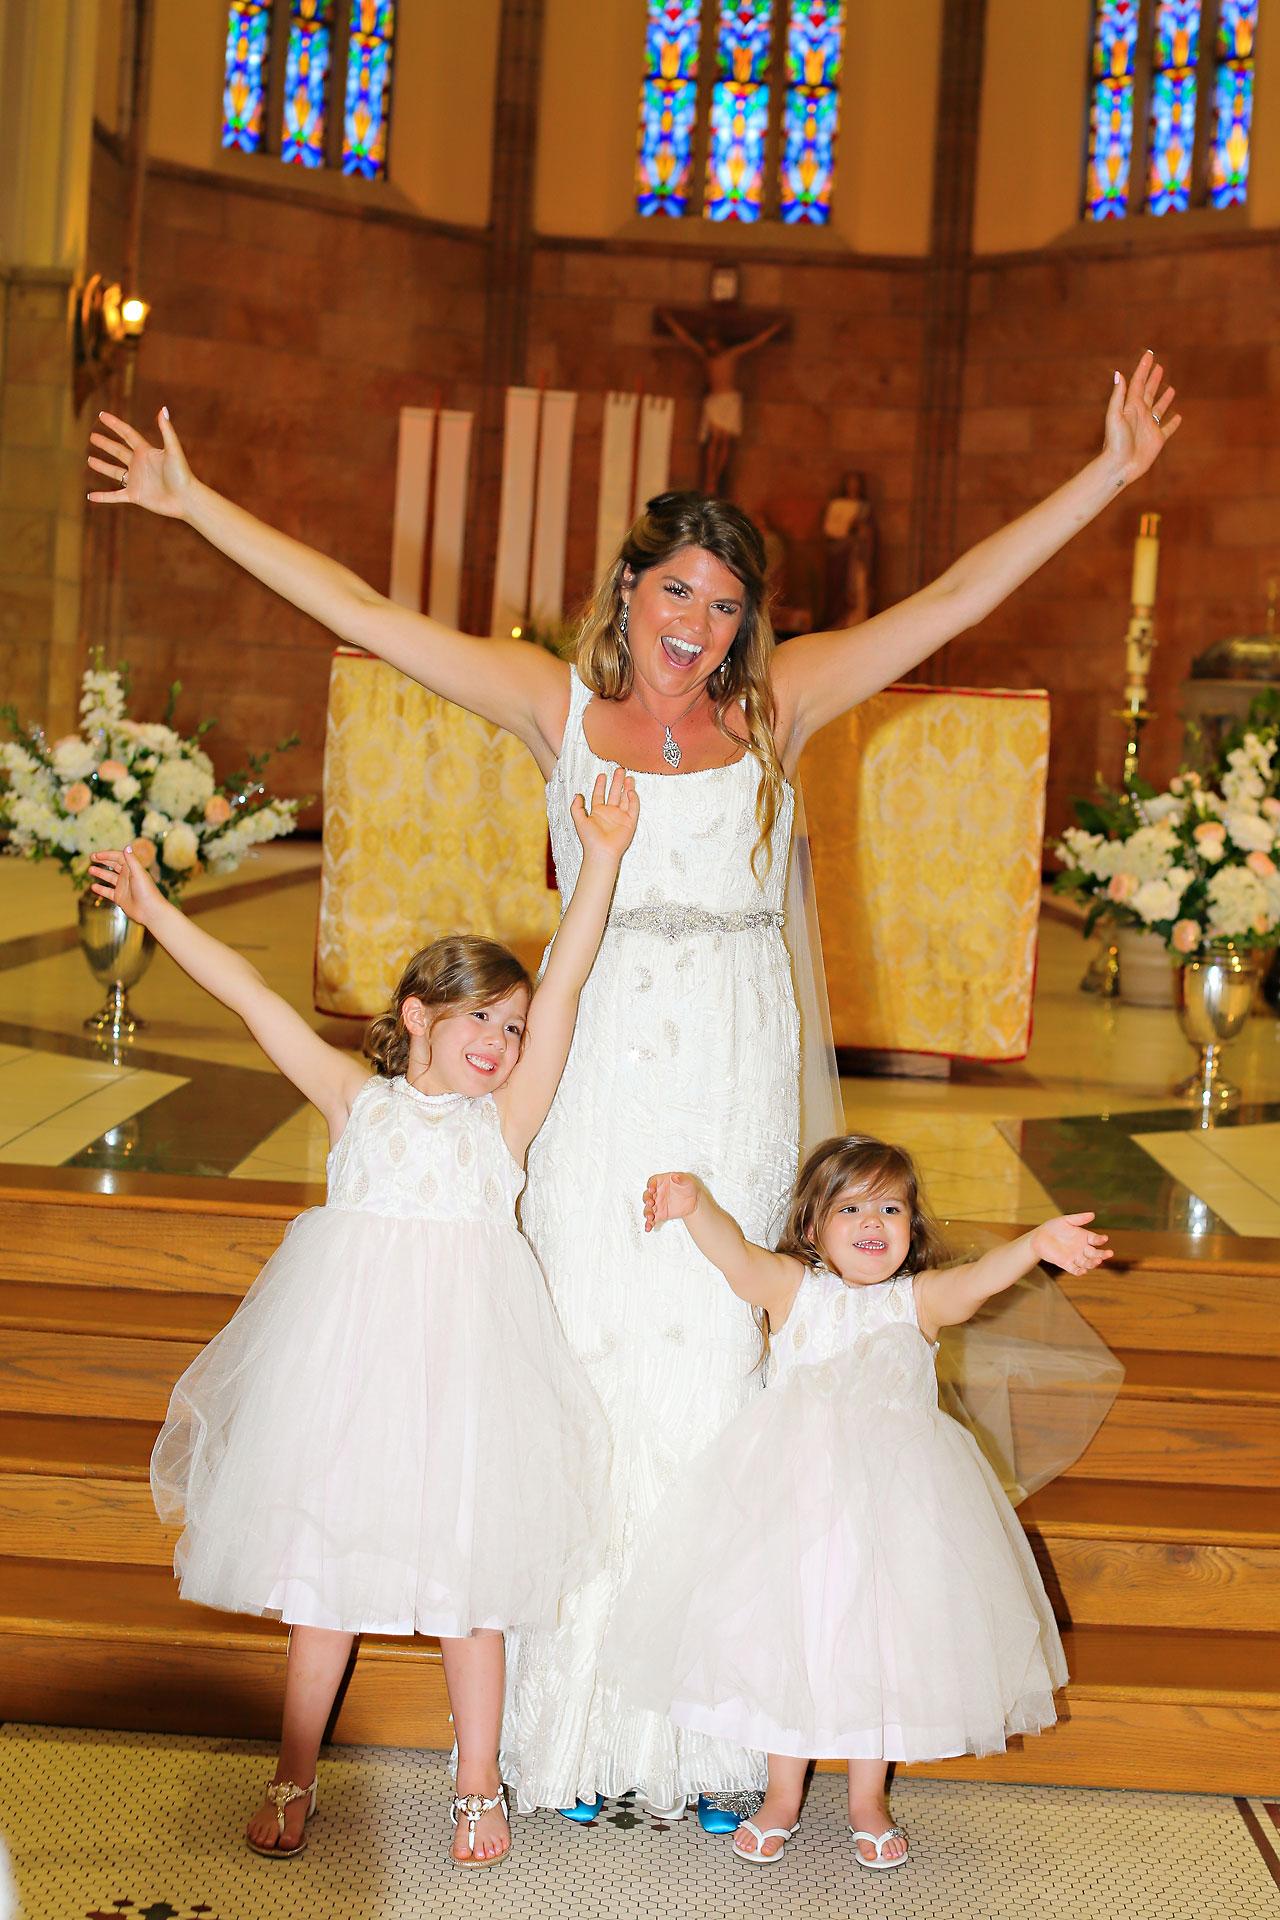 Amy Nick Canal 337 Wedding 081